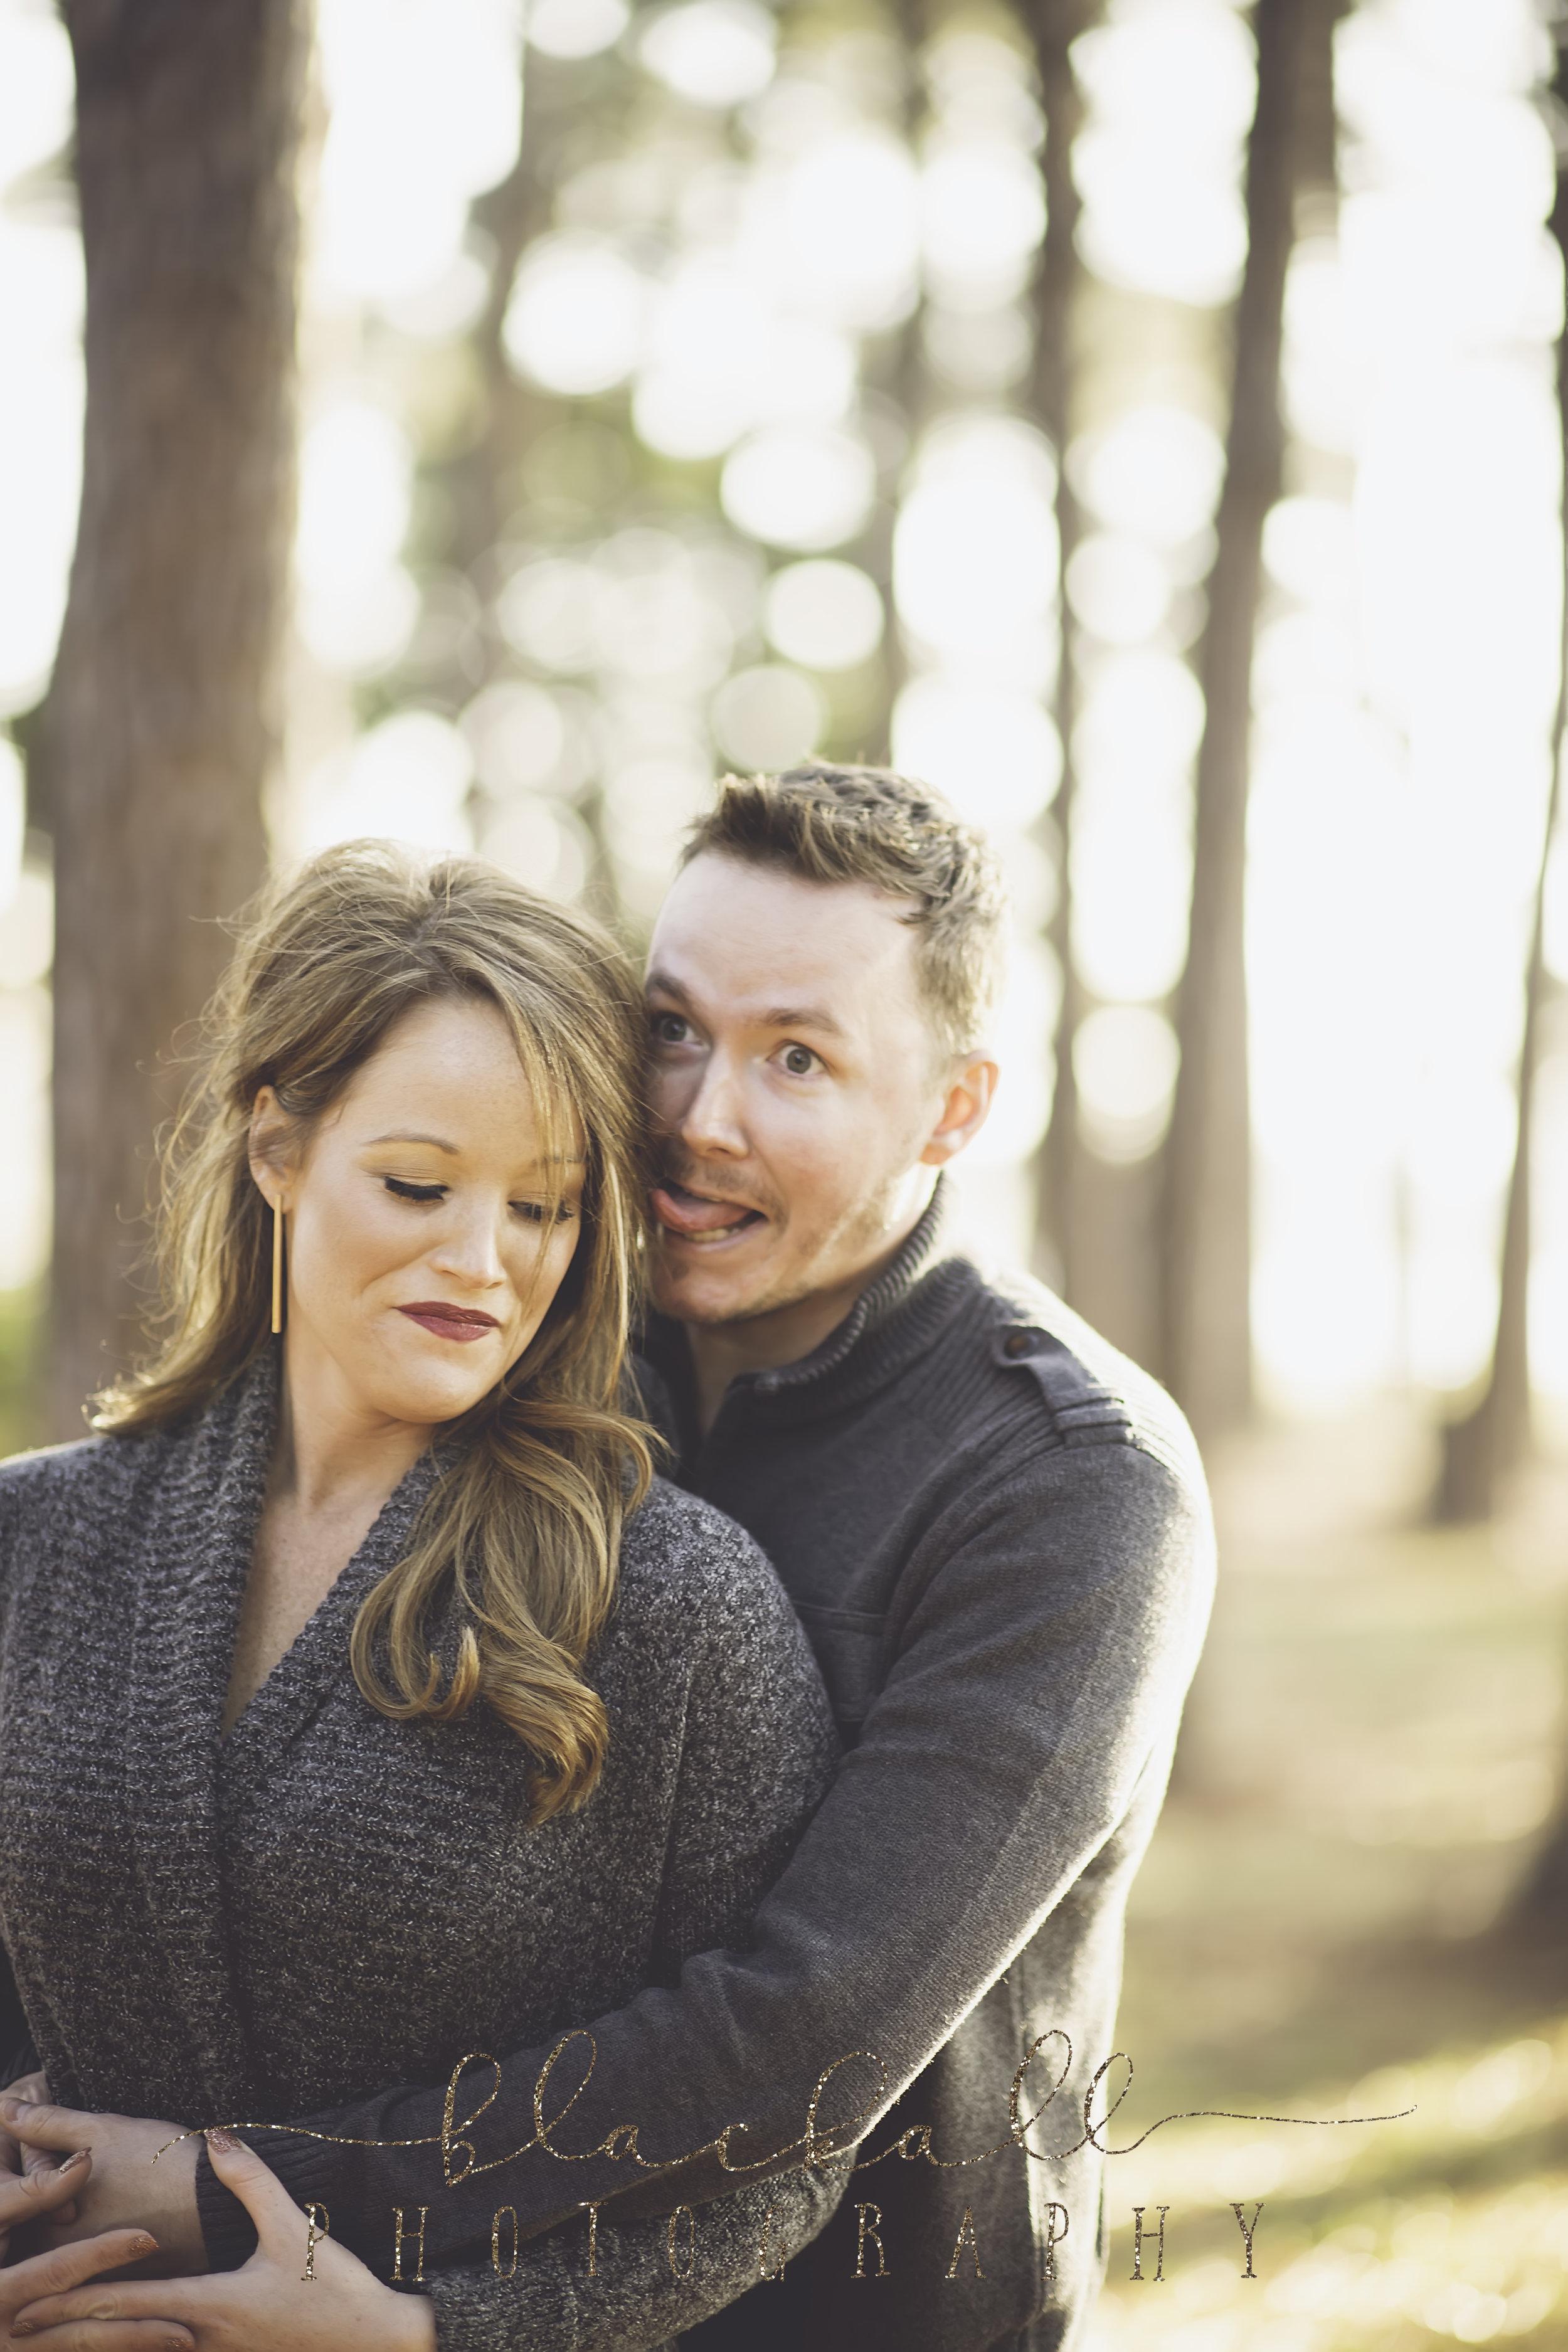 Engagement photos... such a serious solemn event. ;P